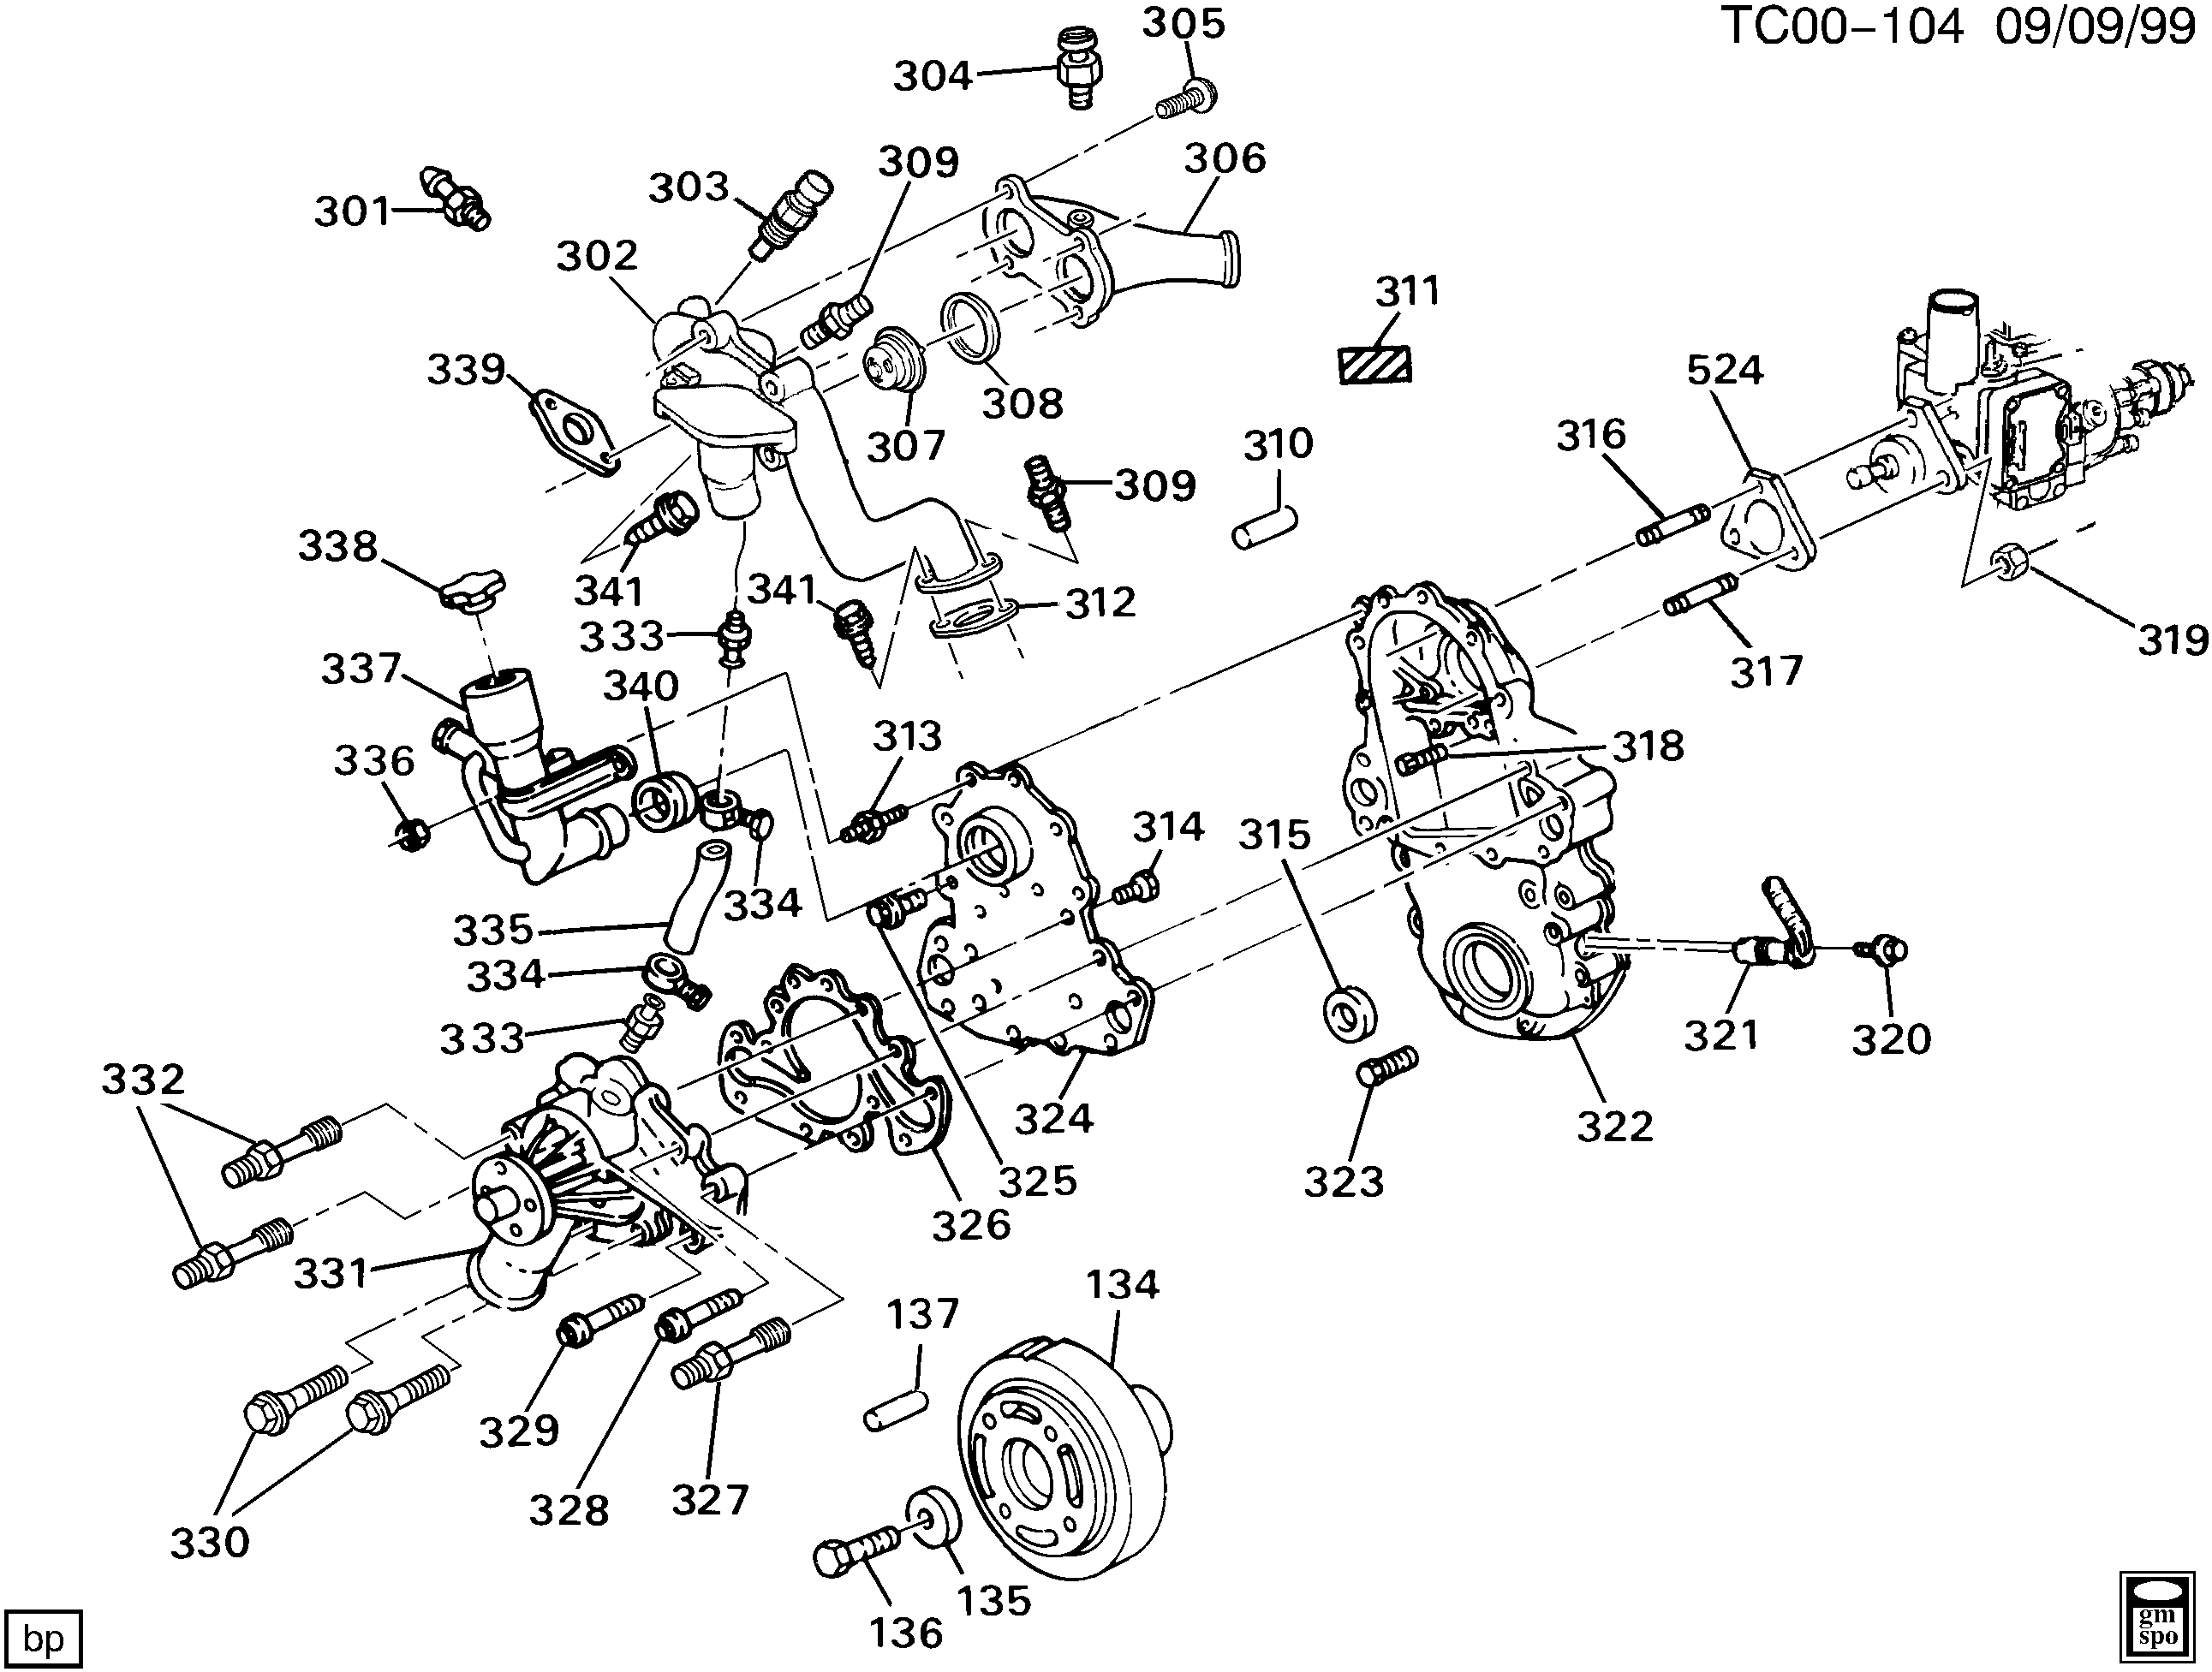 chevy 3 5l engine parts diagram chevy malibu 3 5l engine diagram c1500 suburban 2wd - engine asm-6.5l v8 diesel part 3 ...